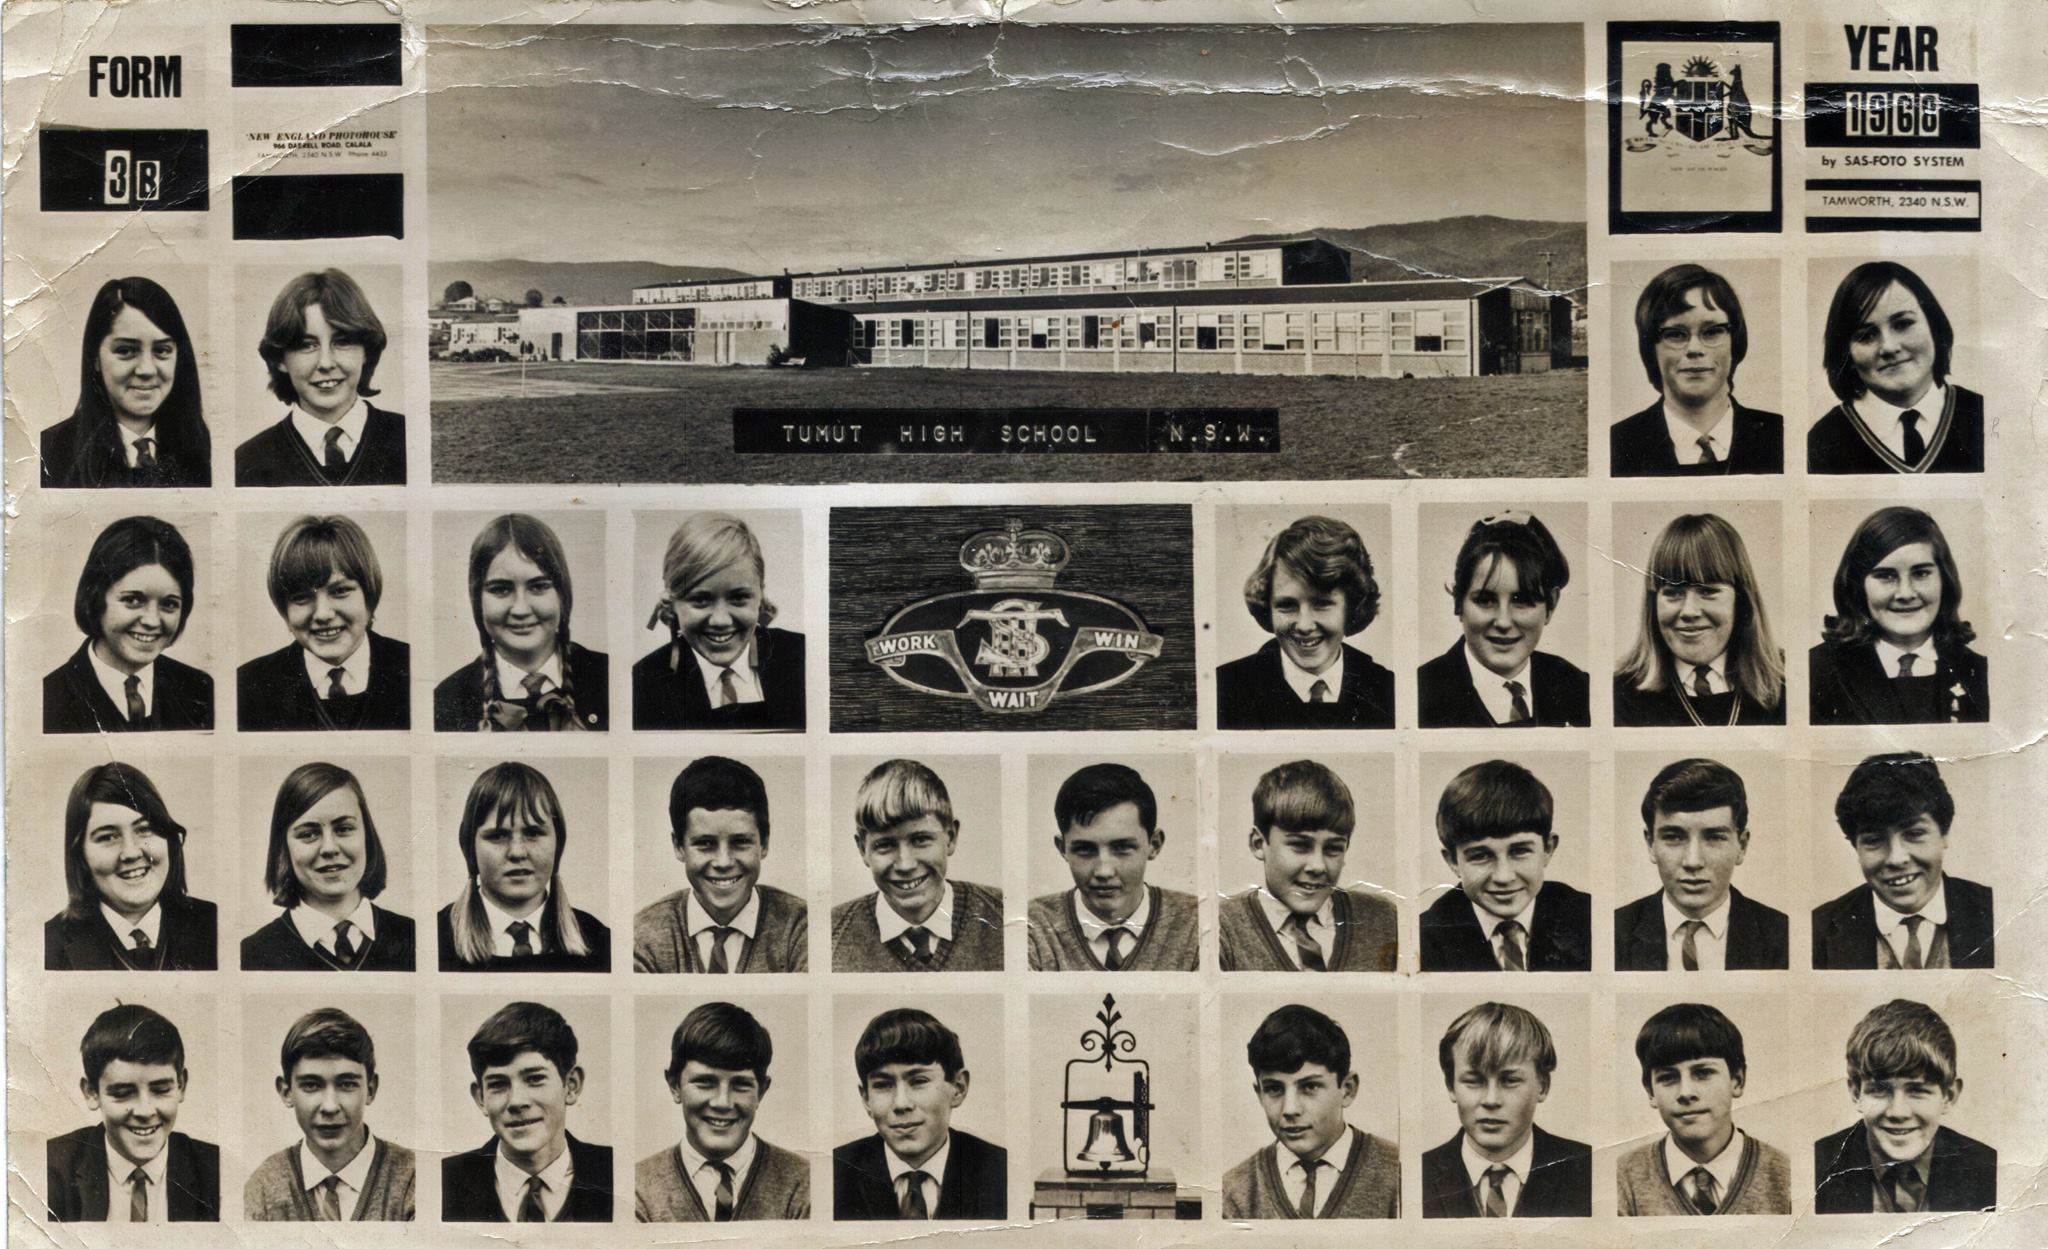 billfairbairn-1968-ths